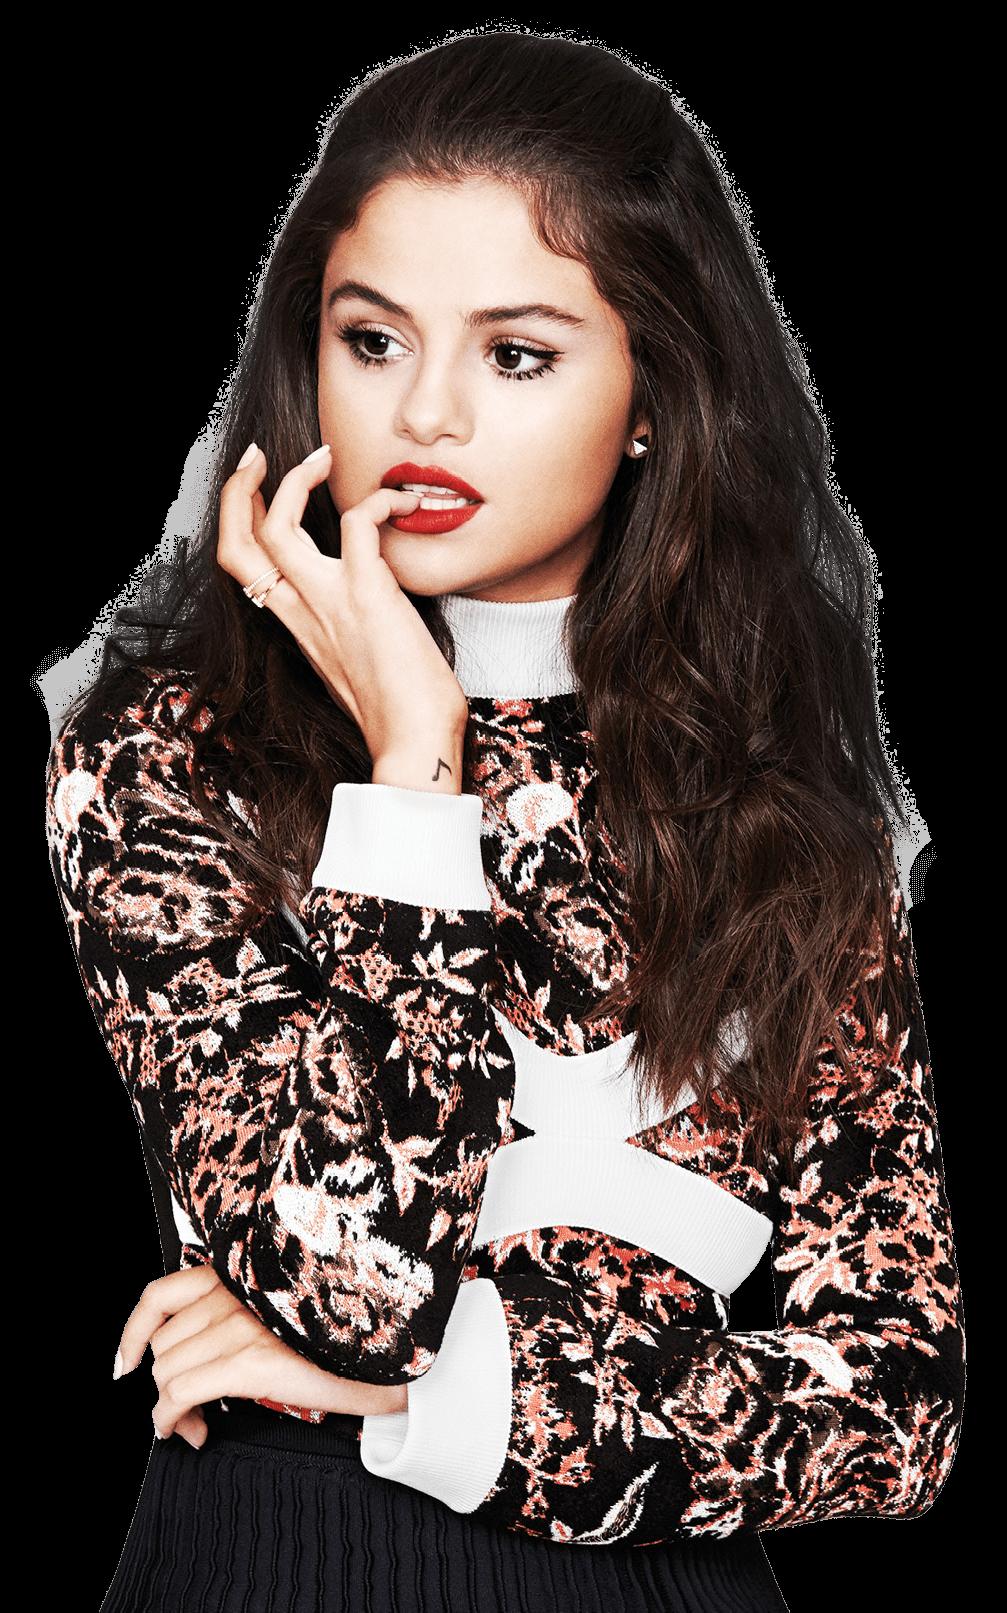 Selena gomez clipart clip transparent stock Selena Gomez Thinking transparent PNG - StickPNG clip transparent stock